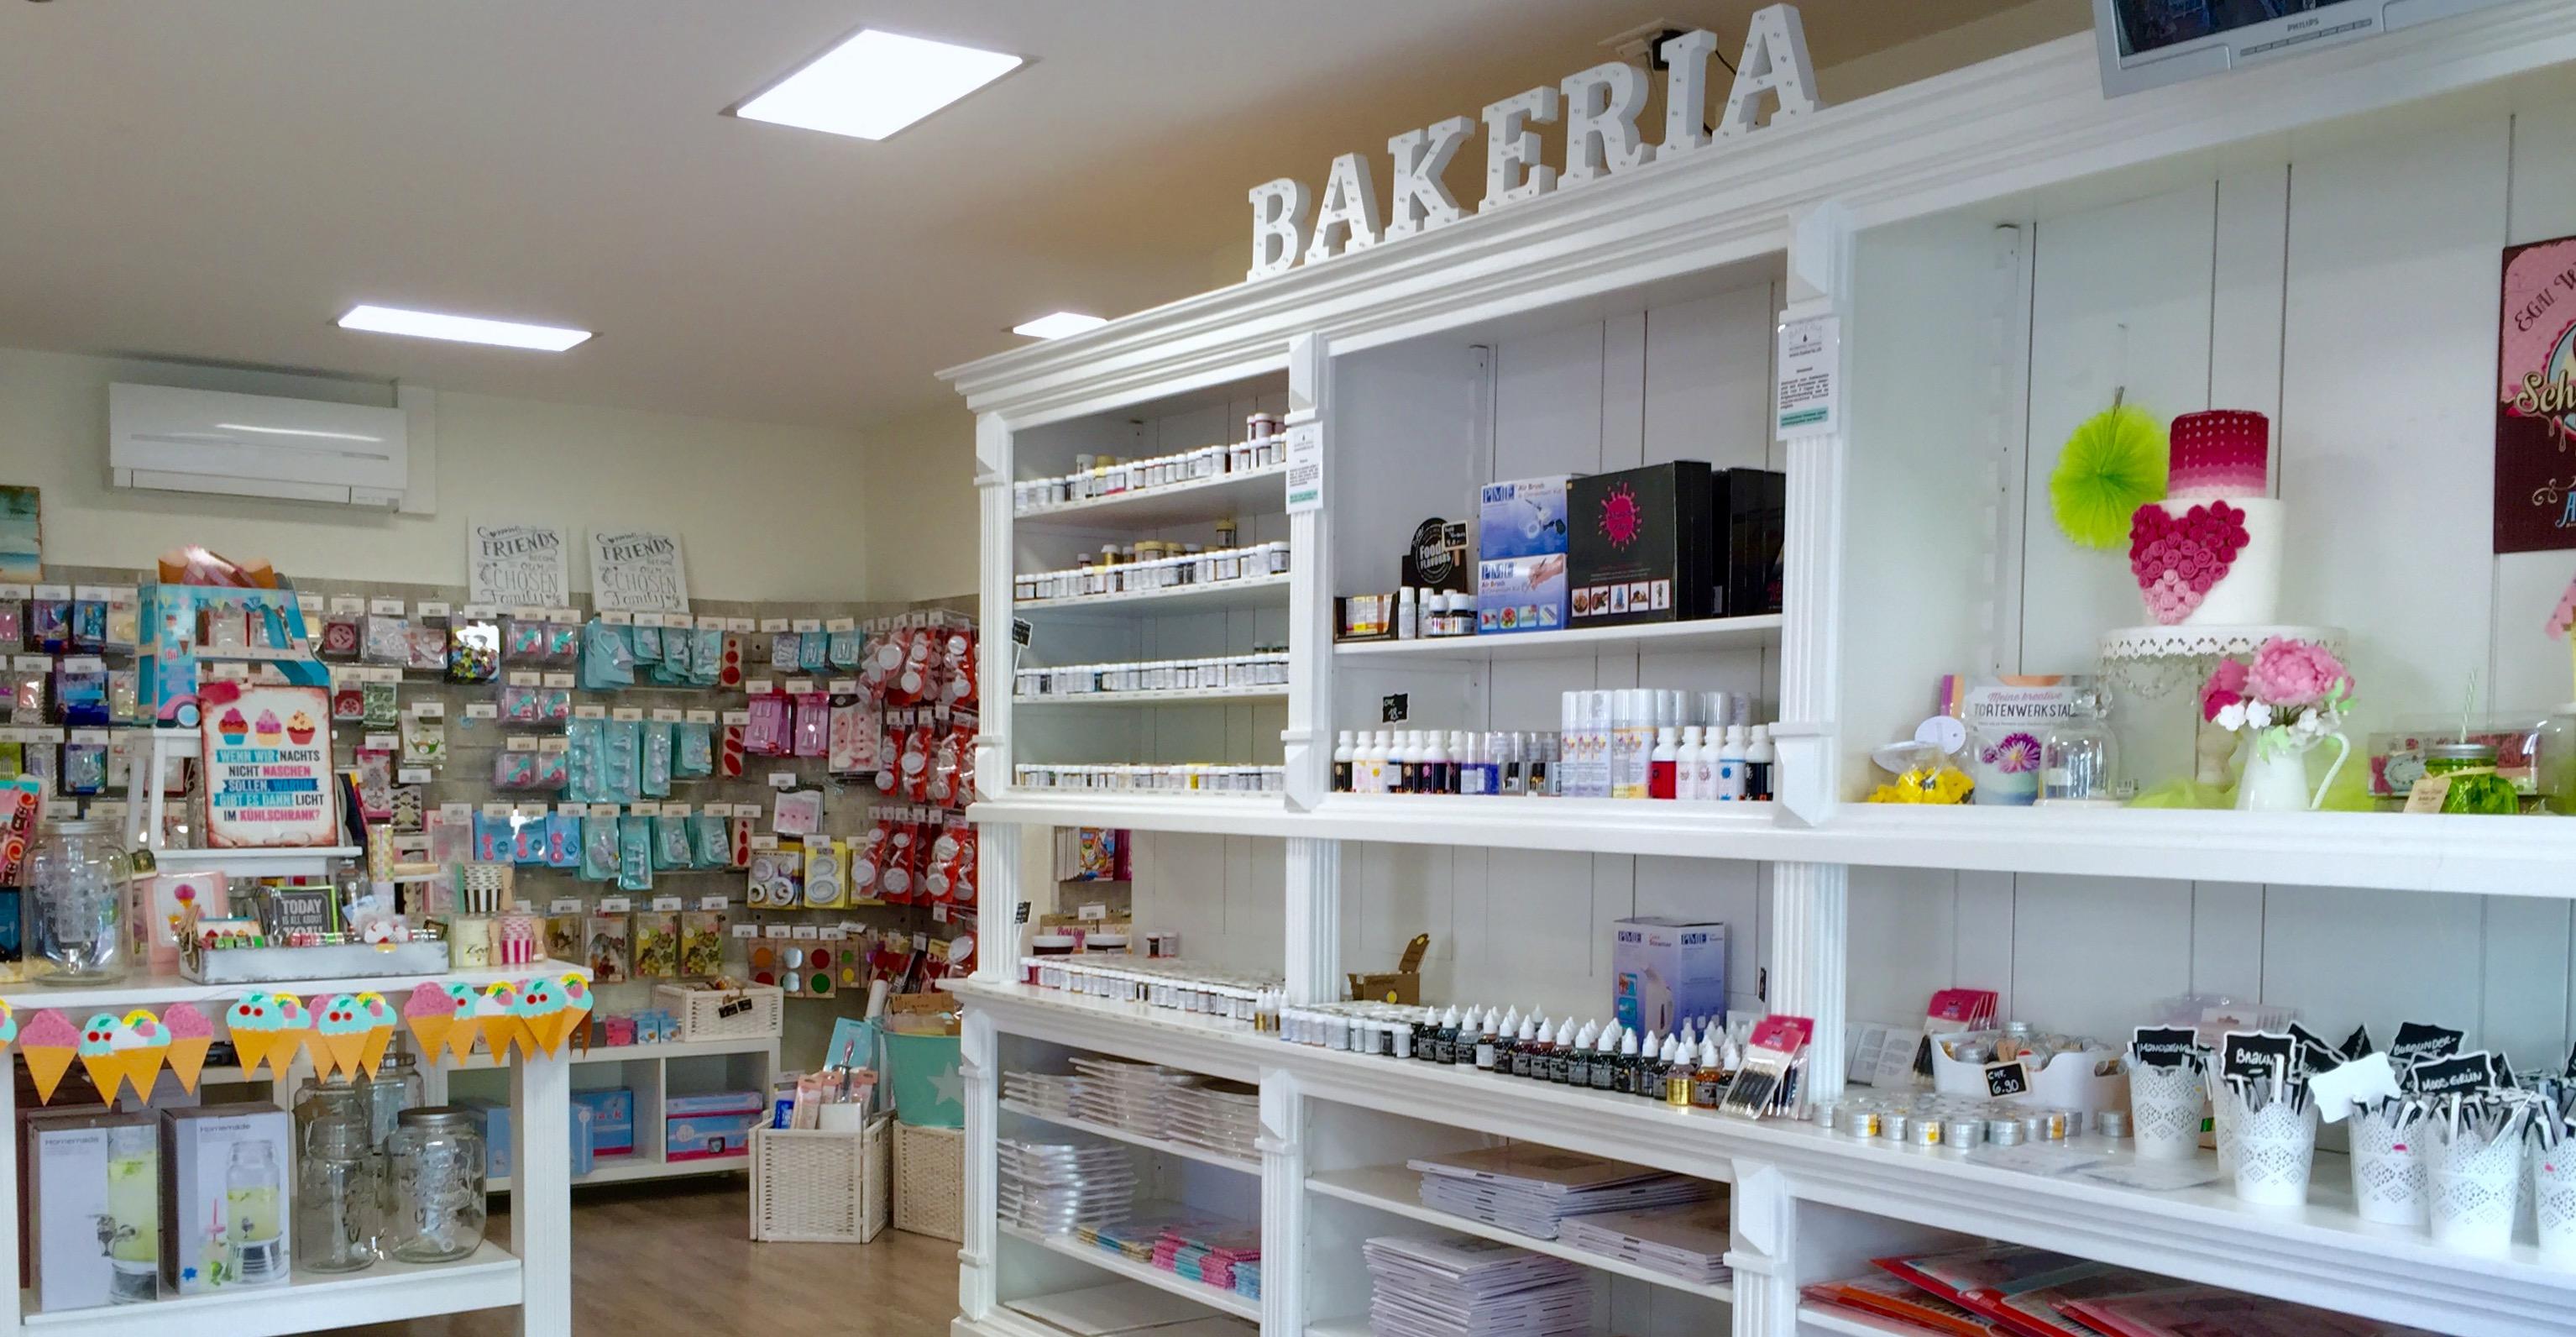 schneller kurs vintage interieur design, bakeria backladen schweiz - bakeria, Design ideen